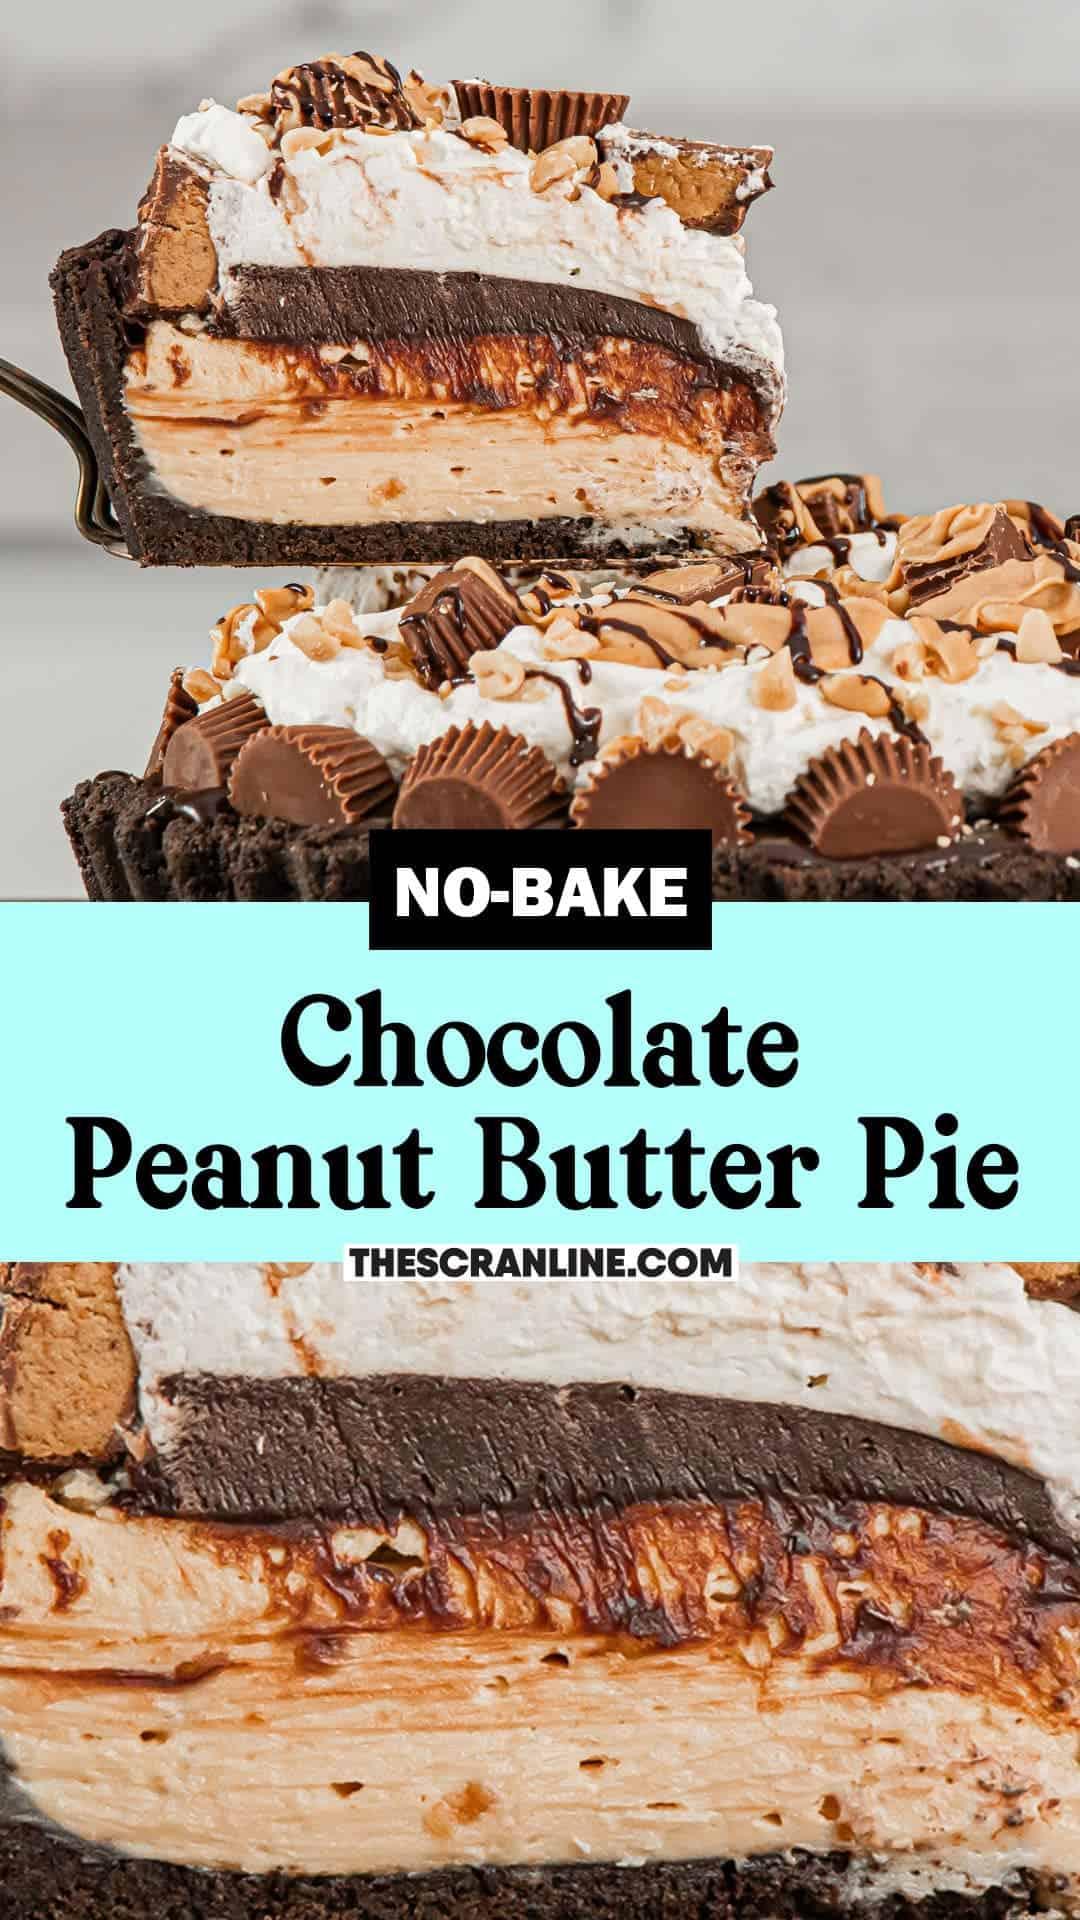 Pinterest image of No-Bake Chocolate Peanut Butter Pie.